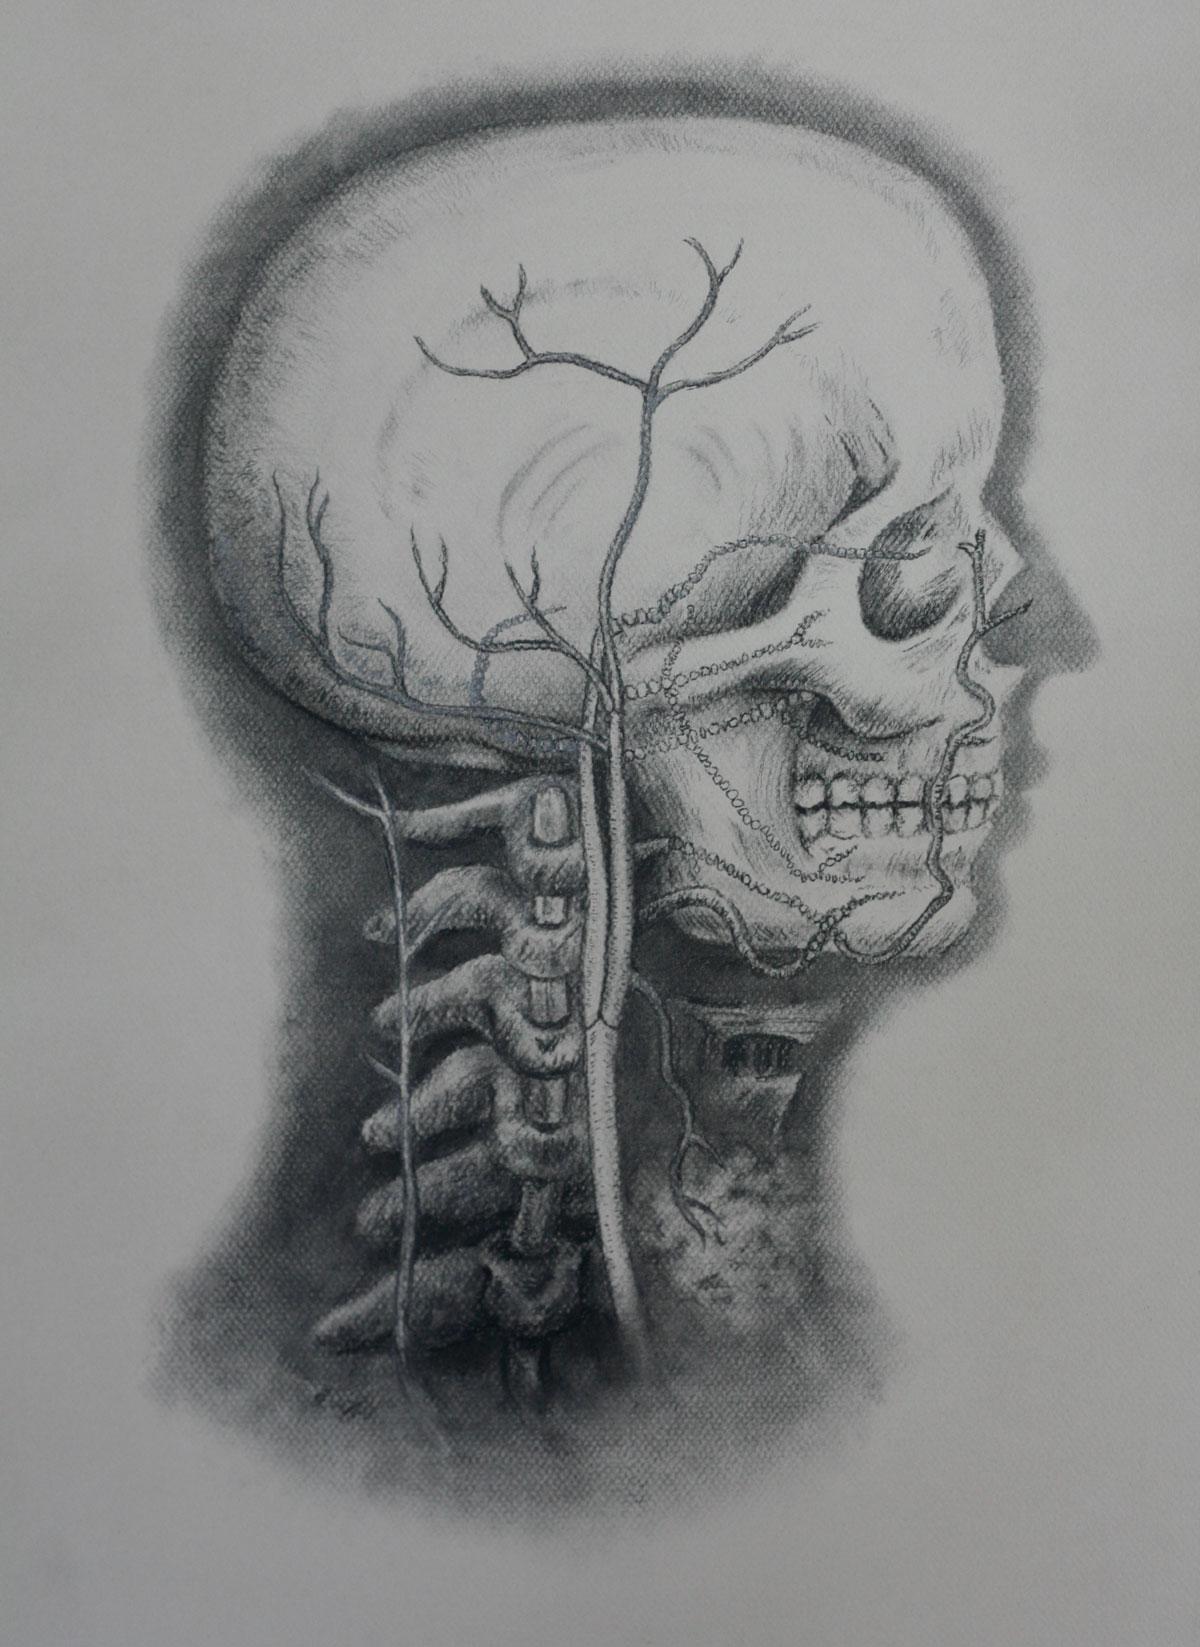 Mind and Specimen (Study no. 2)